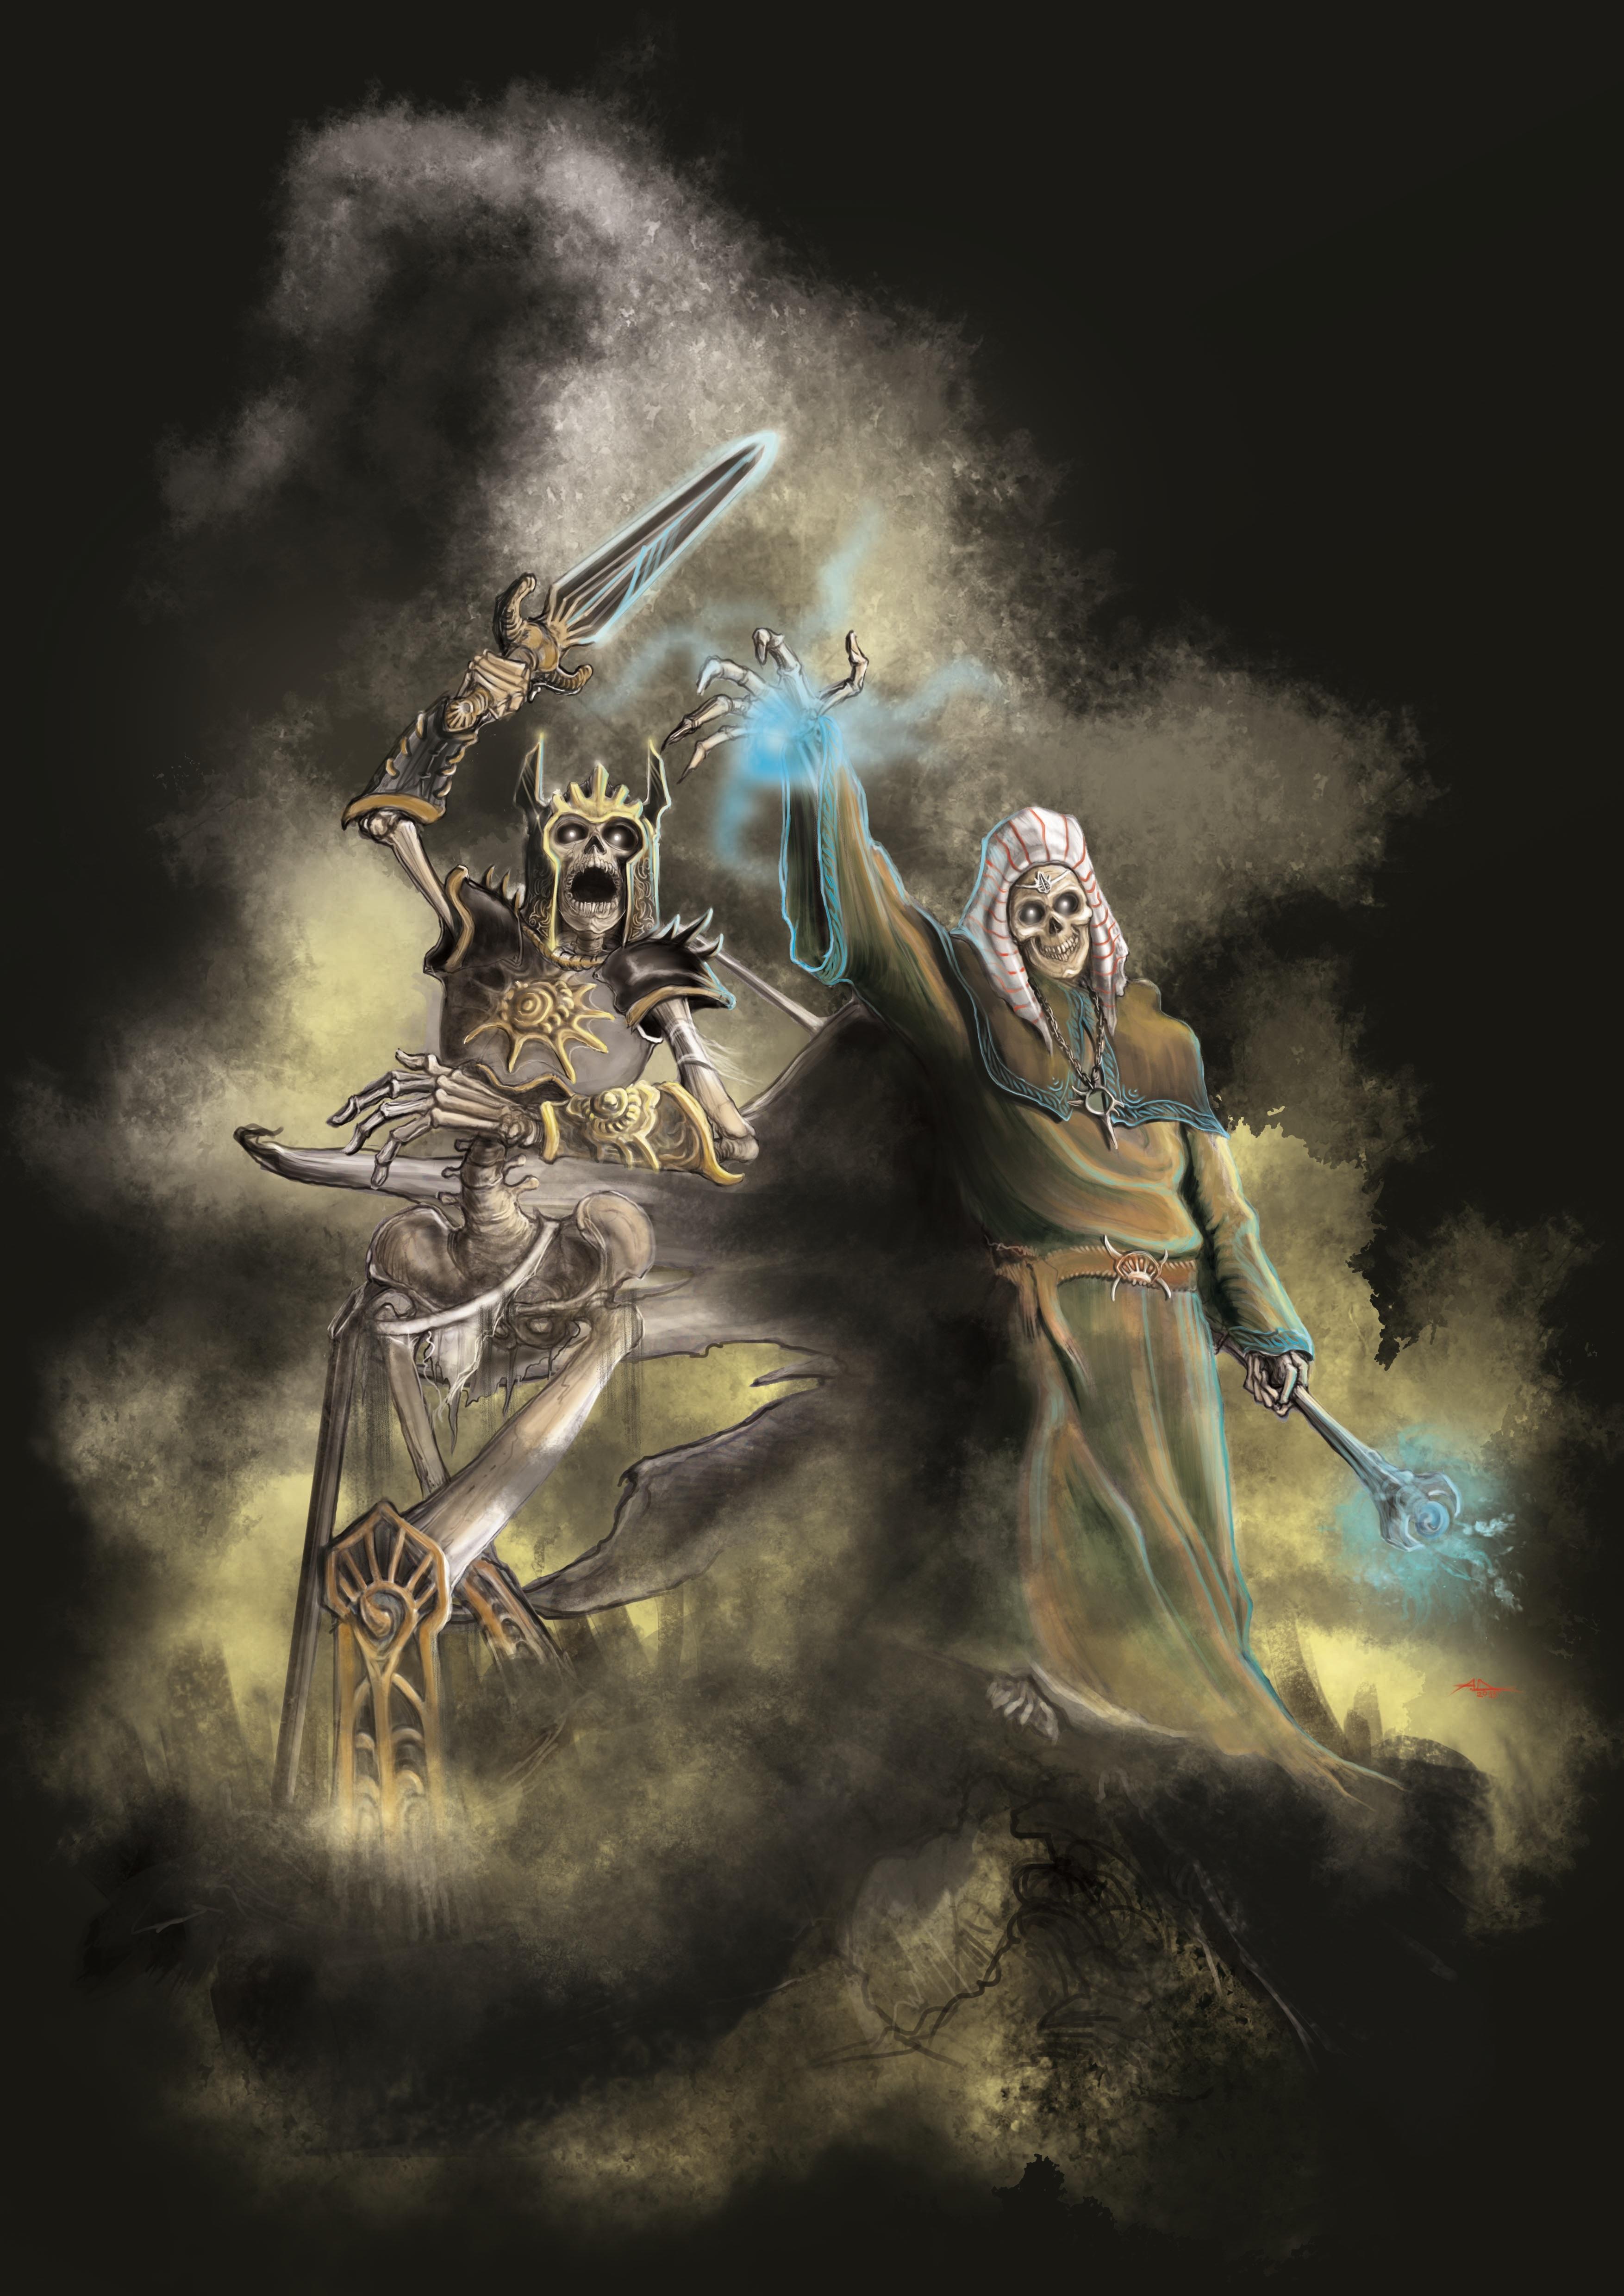 Skeleton champions